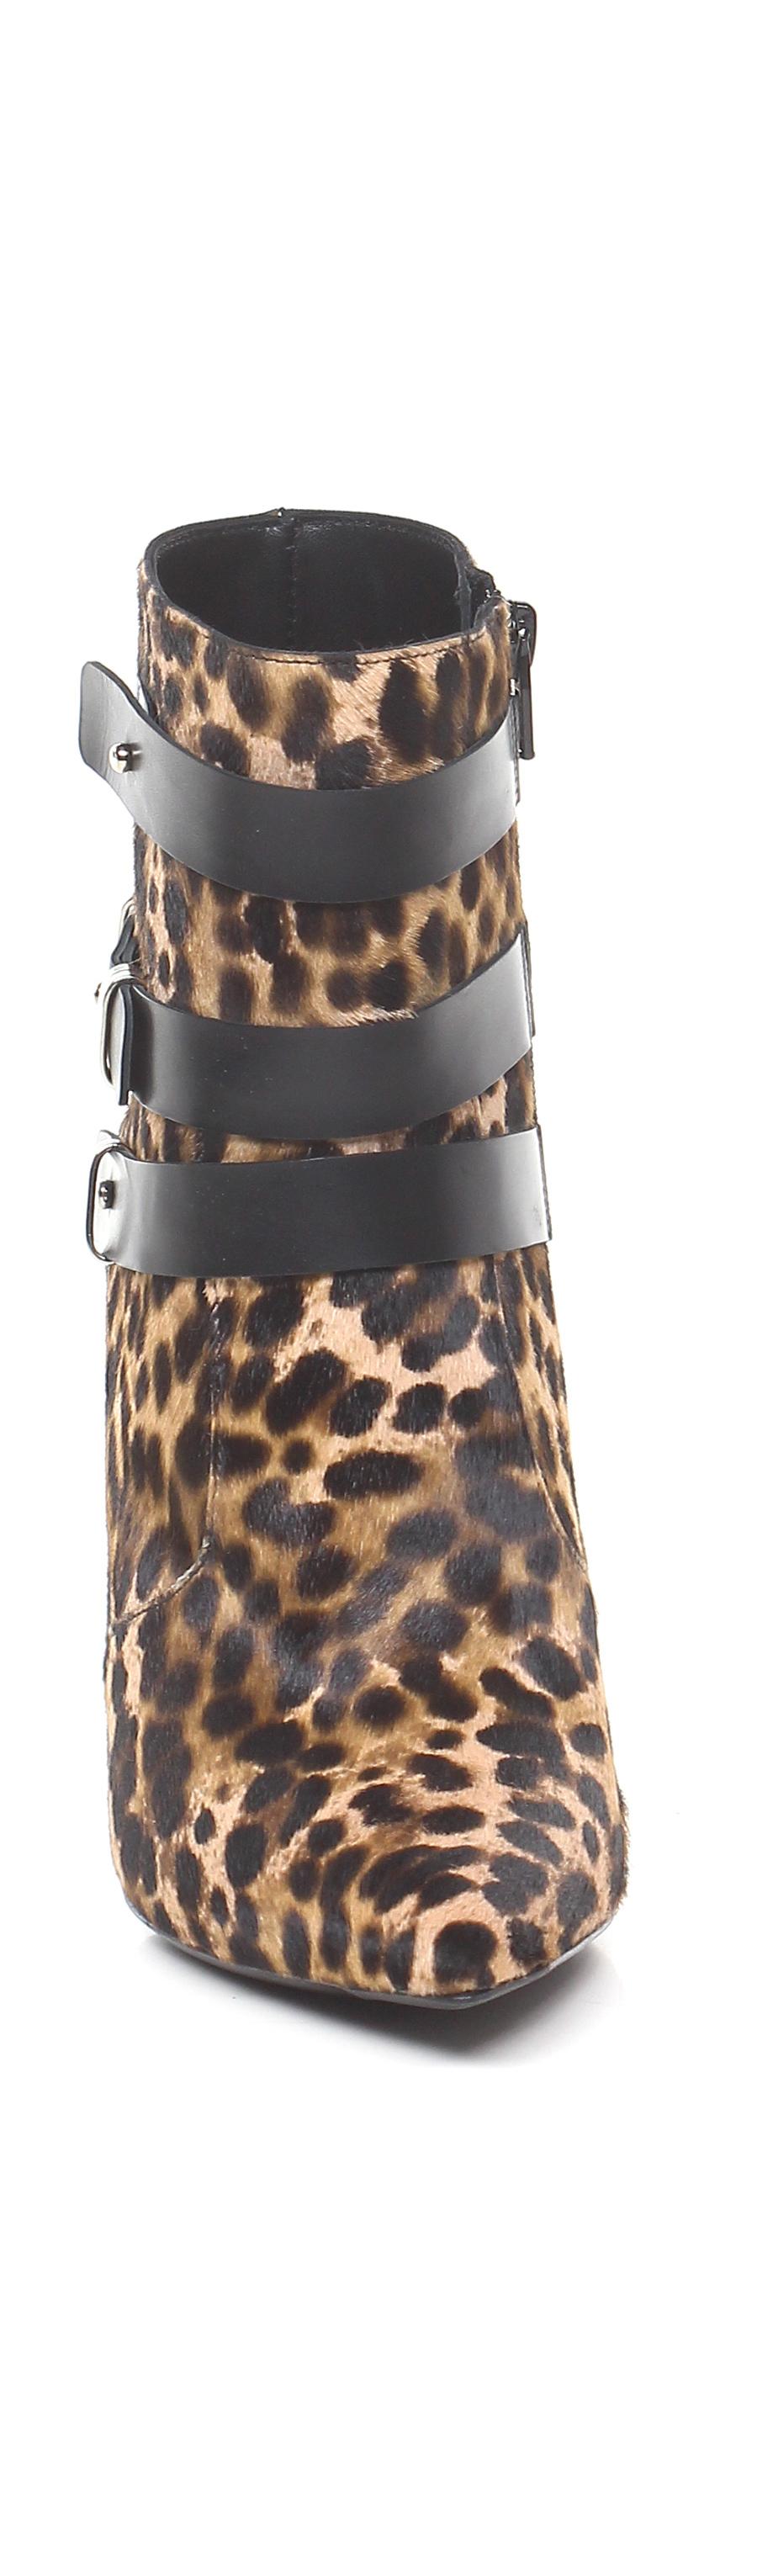 Tronchetto Leopardo/nero Guglielmo Rotta Verschleißfeste billige Schuhe